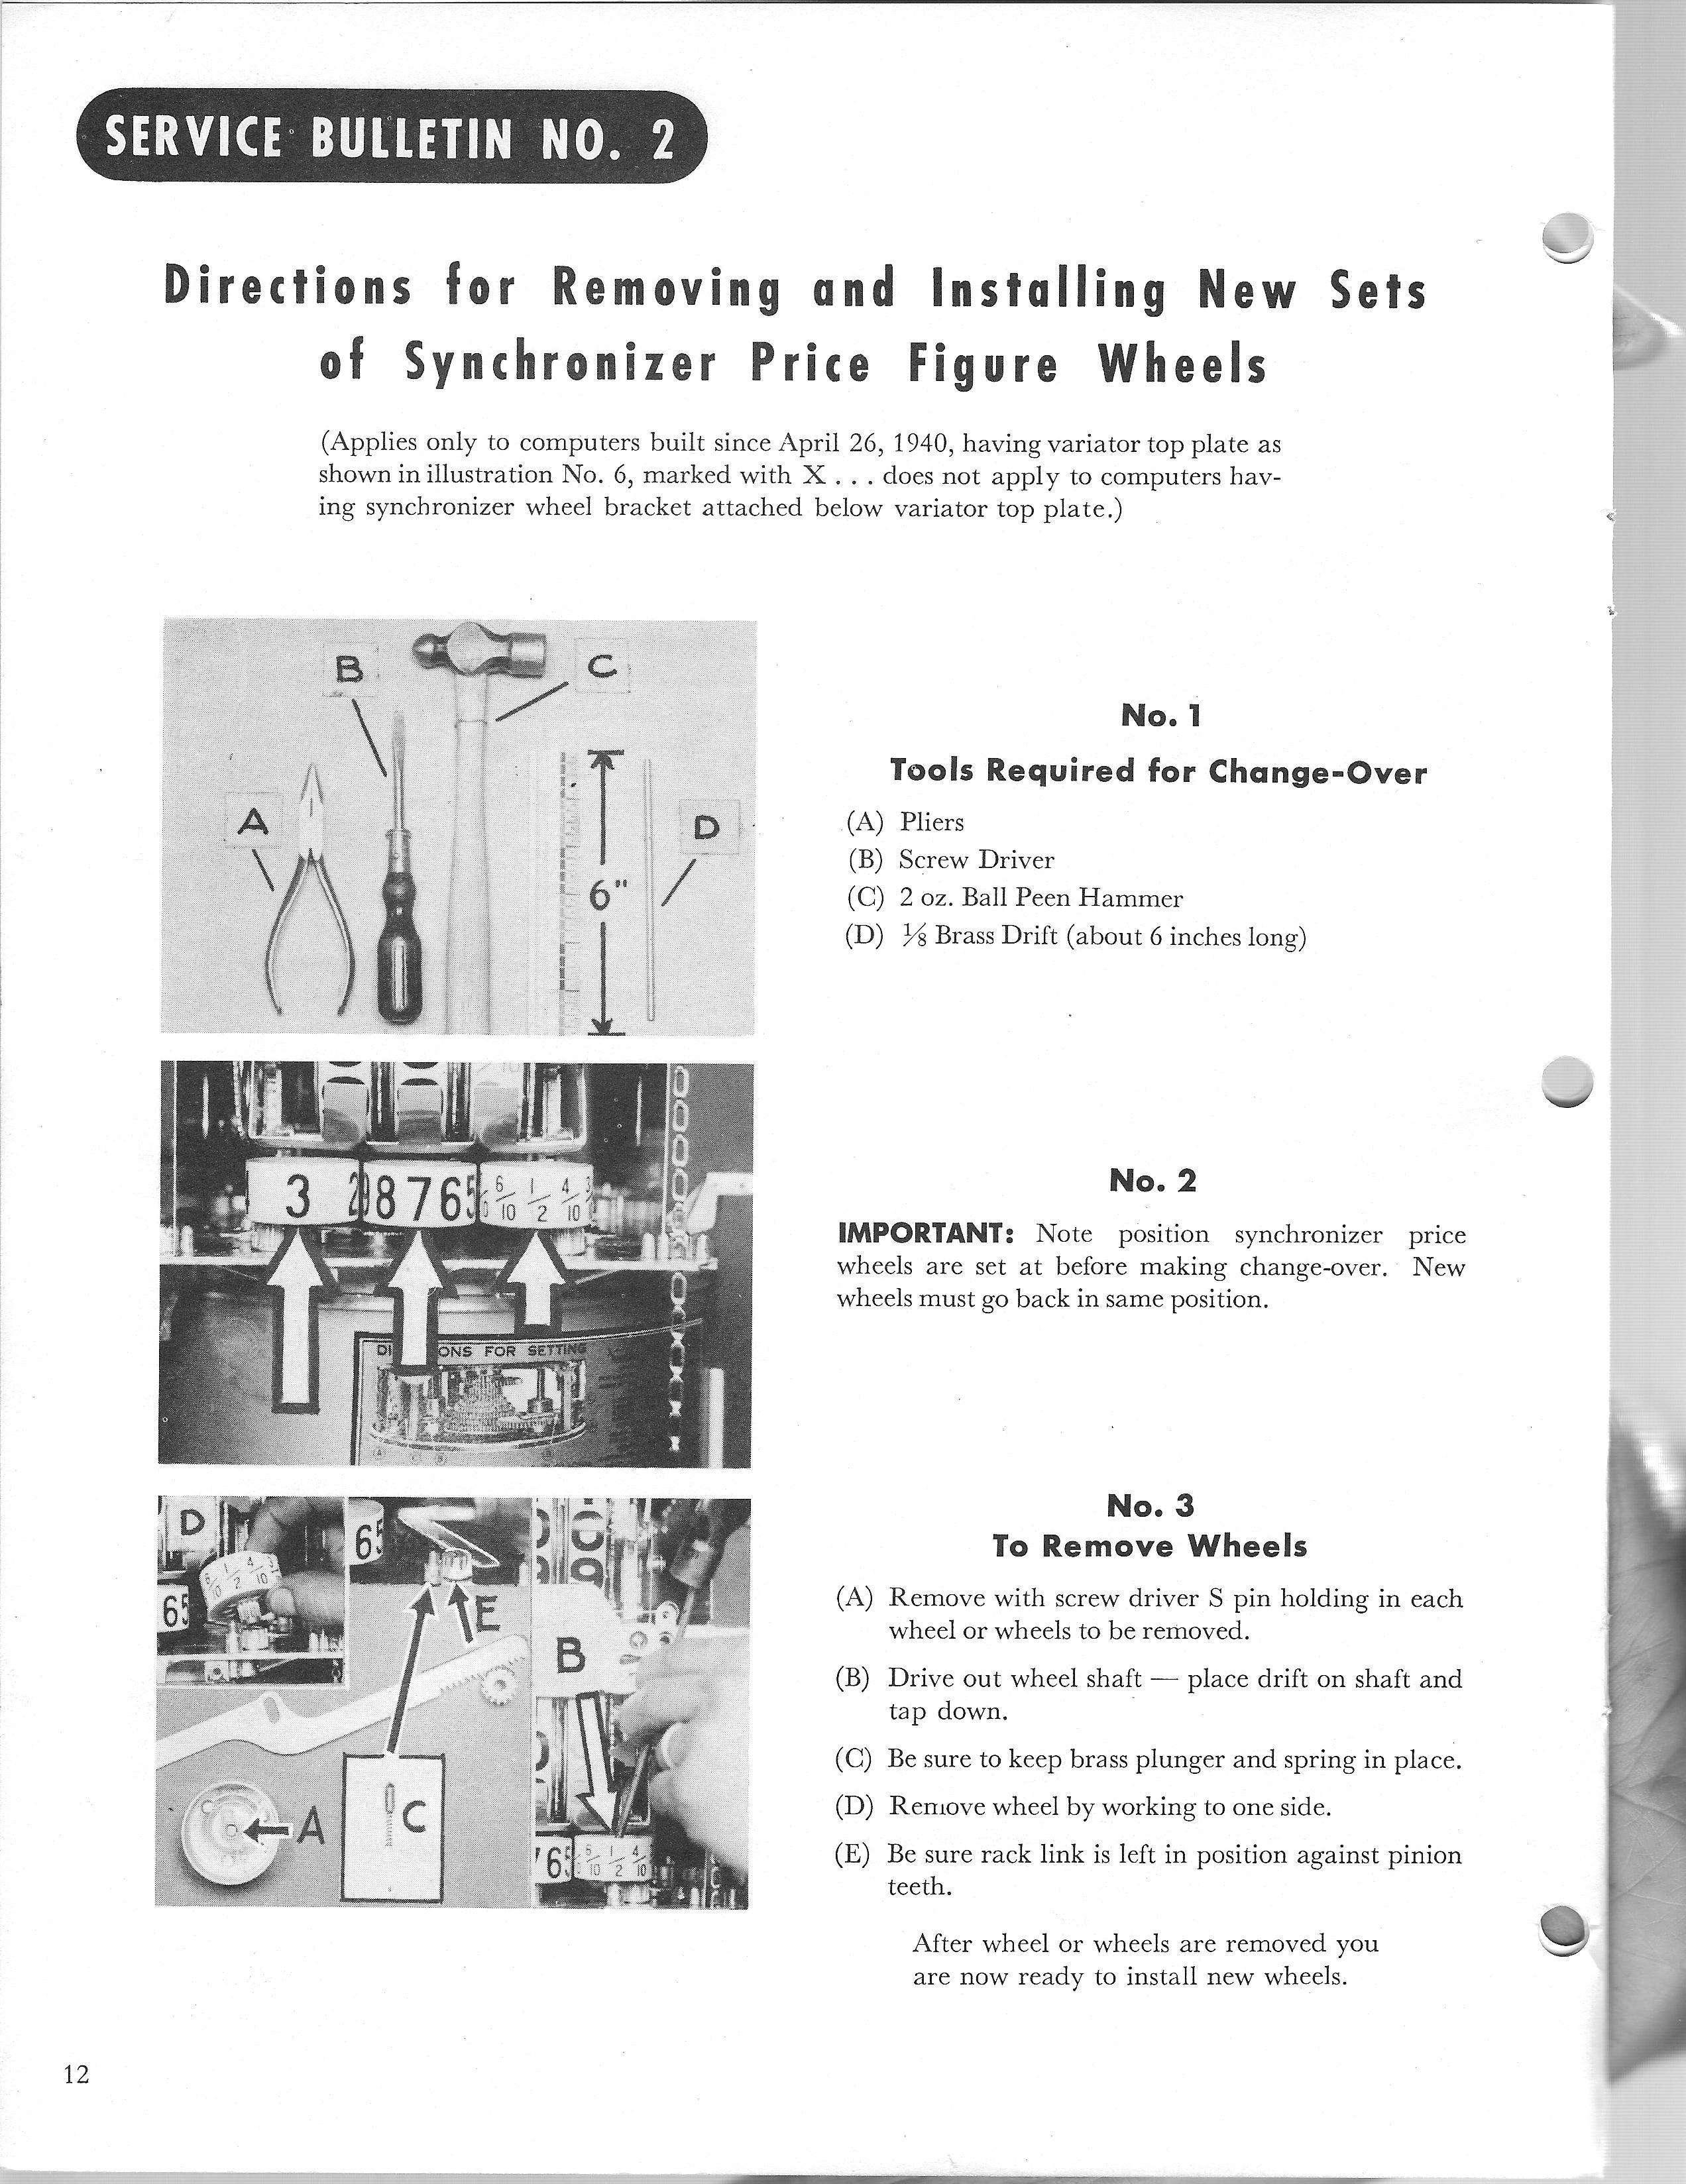 Veeder Root Service Manual